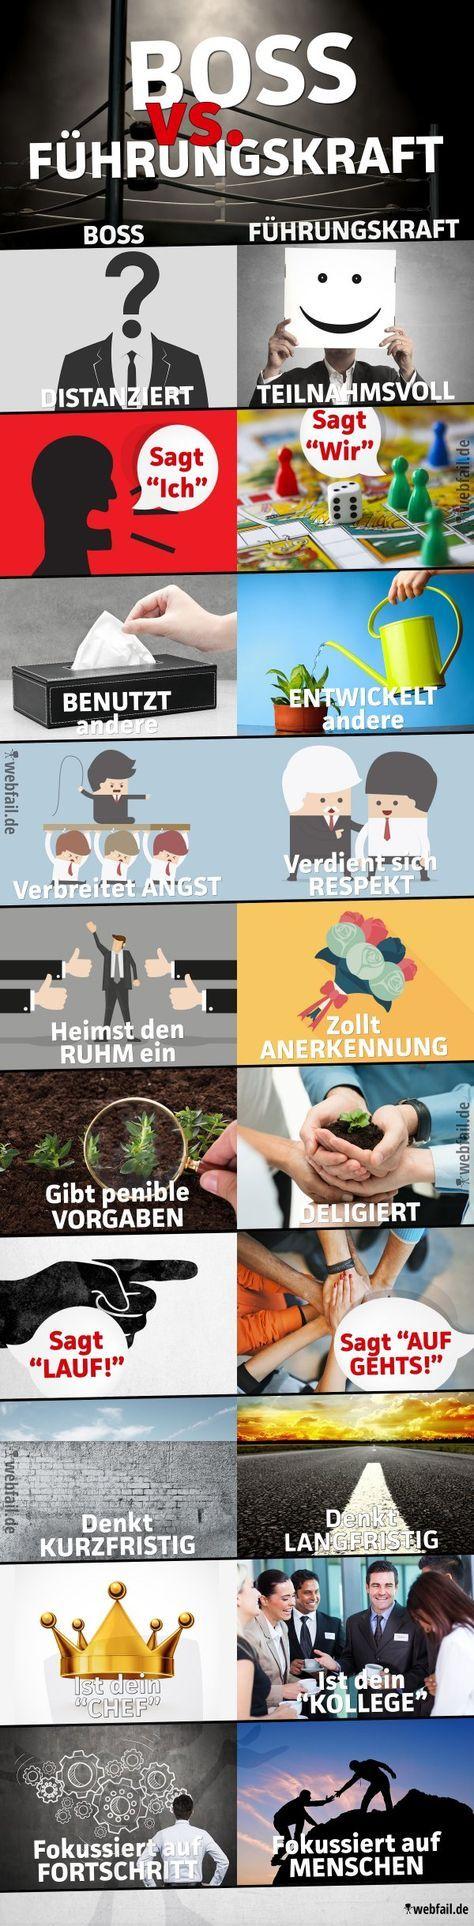 Boss vs. Führungskraft - Fact Bild | Webfail - Fail Bilder und Fail Videos ...repinned für Gewinner! - jetzt gratis Erfolgsratgeber sichern www.ratsucher.de